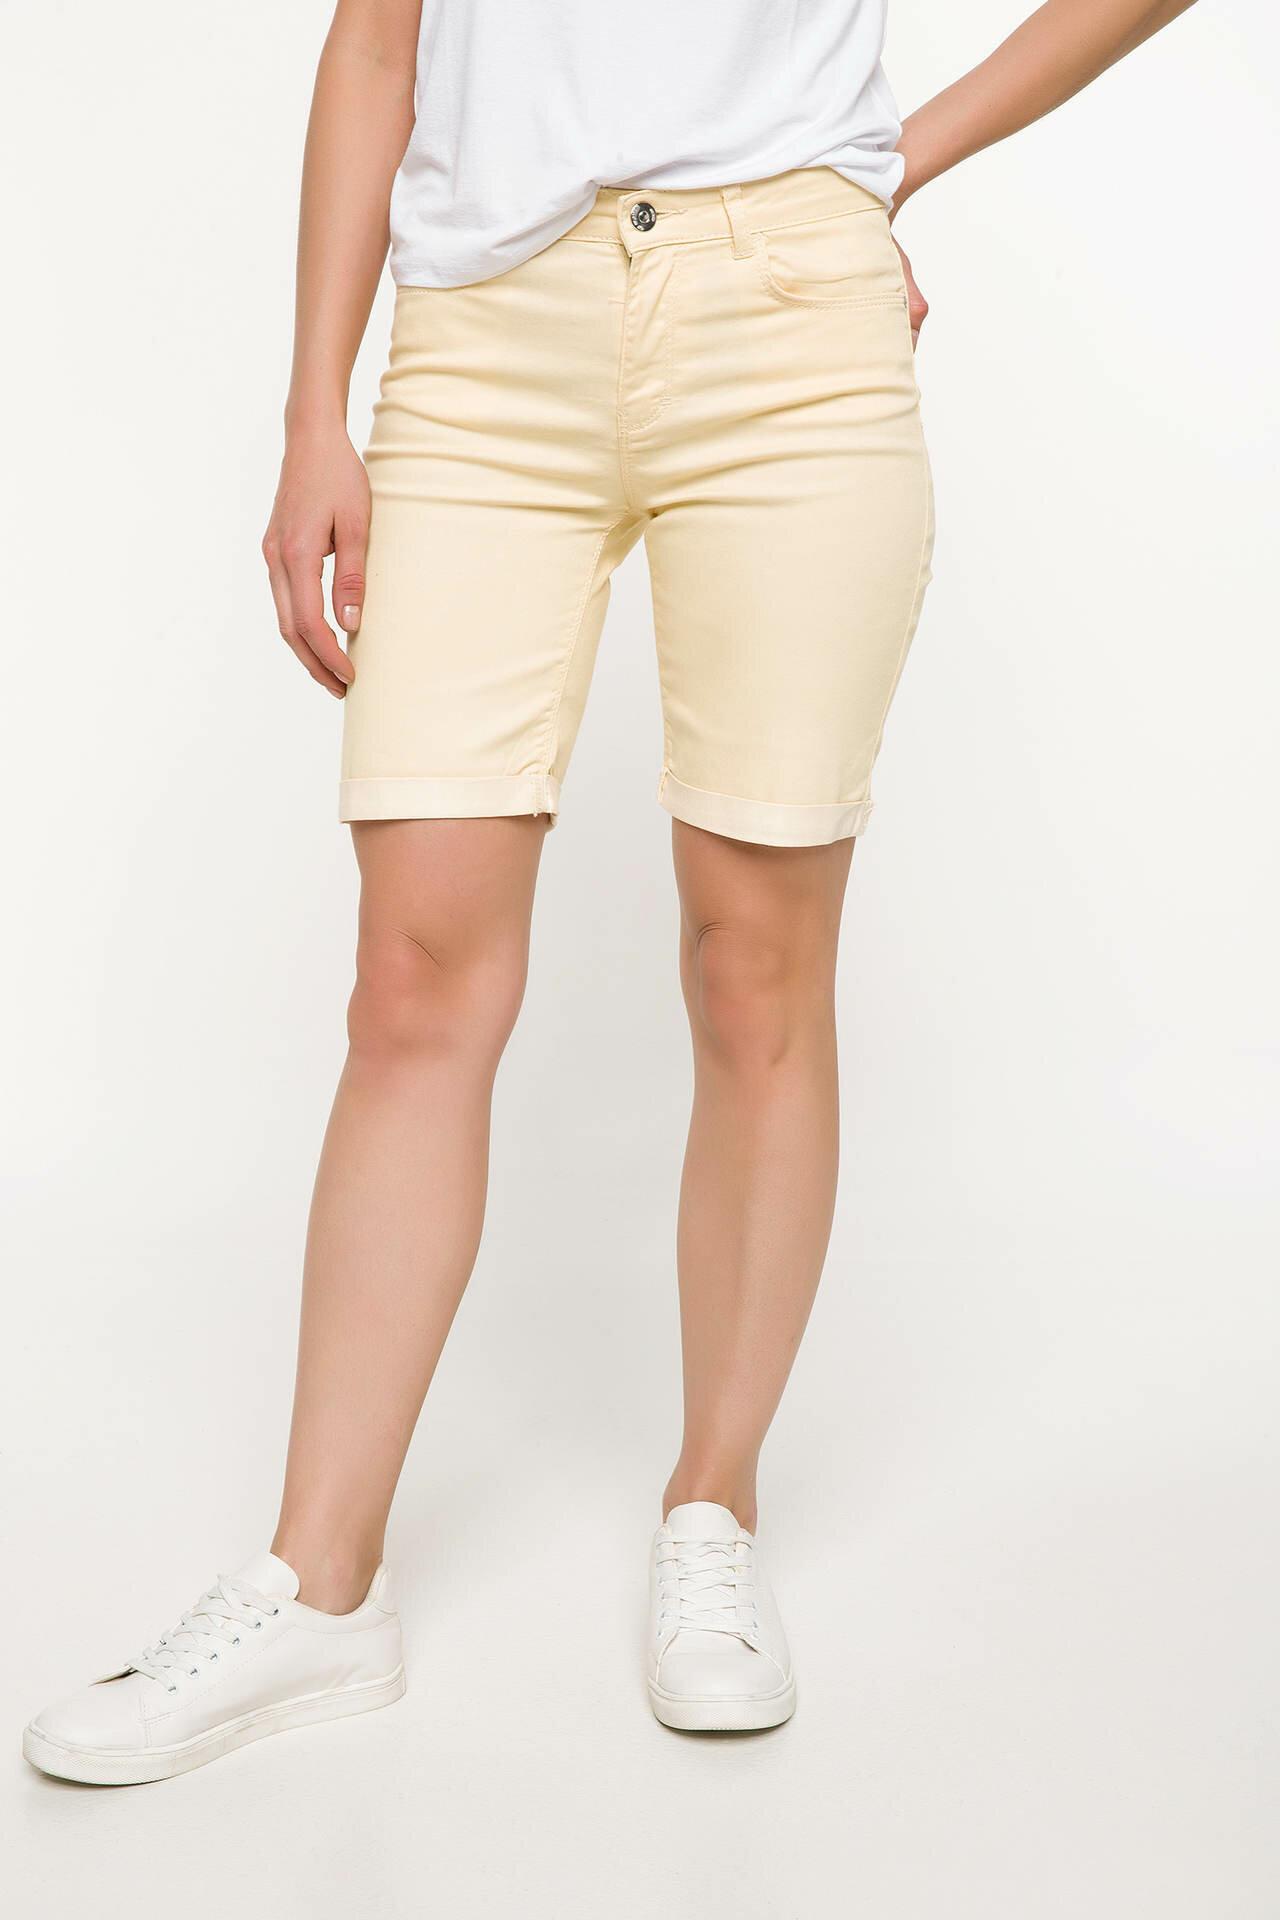 Defacto Cotton Shorts Bermuda Summer Skinny-Woven Yellow Casual Woman Light I4257AZ18SMYL79